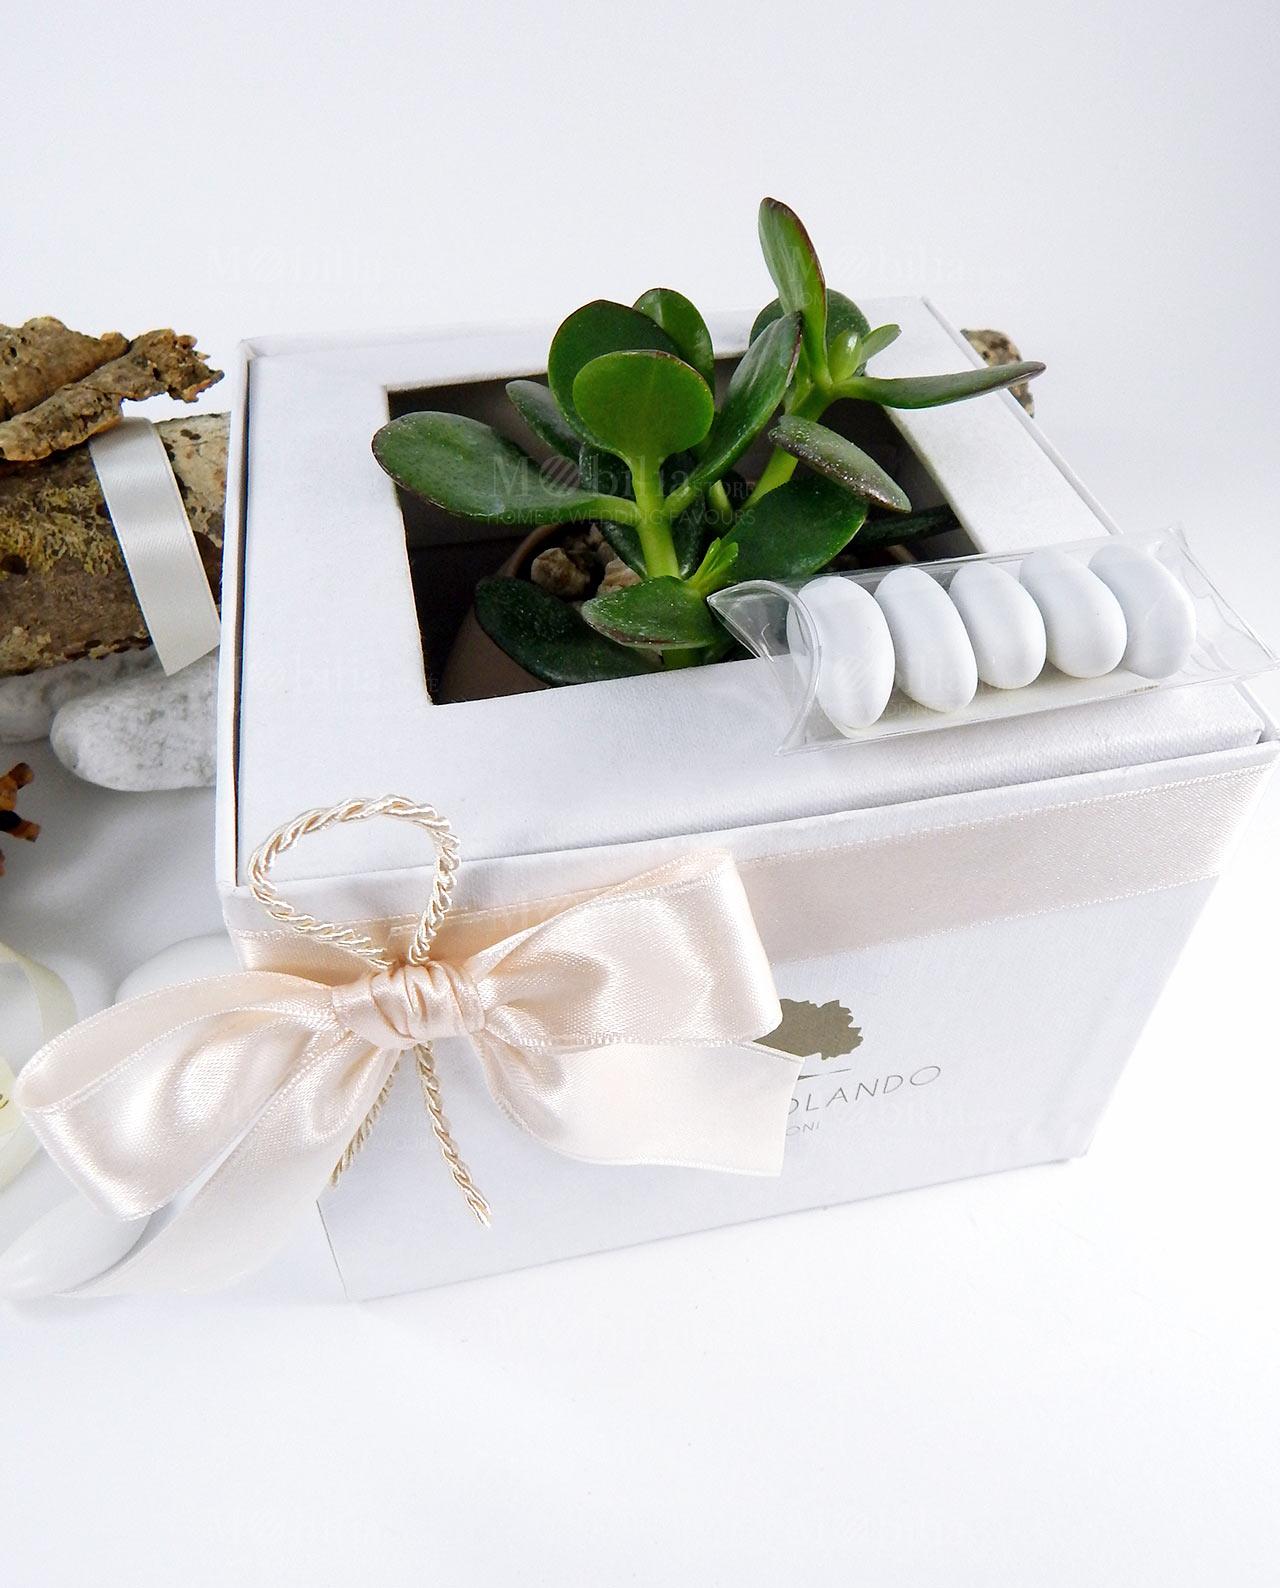 Bomboniere Matrimonio Piante.Bomboniera Pianta Grassa Succulenta Con Vaso Sfera Paola Rolando